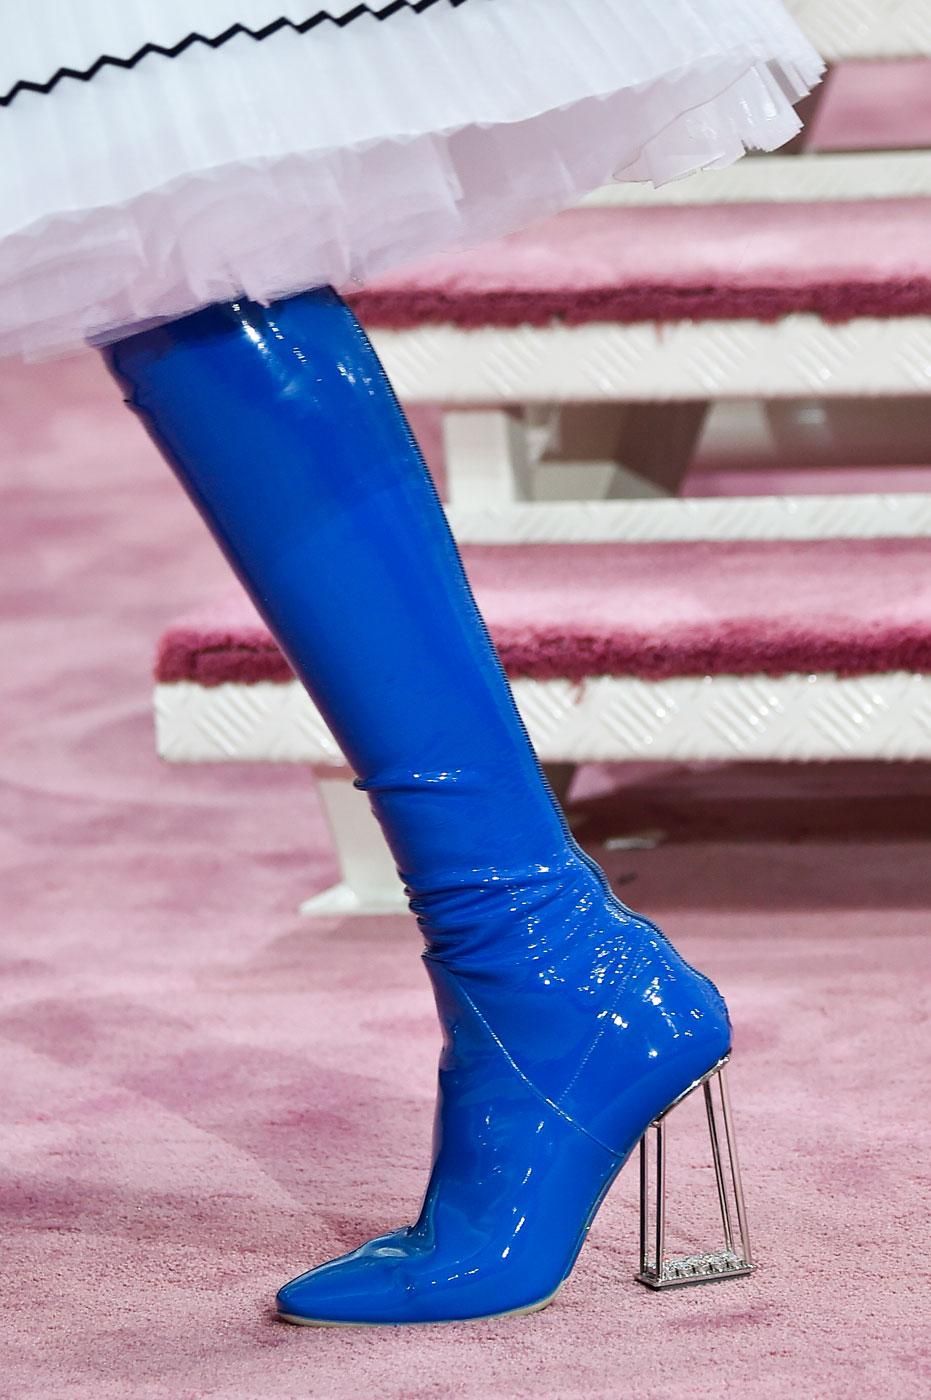 Christian-Dior-fashion-runway-show-close-ups-haute-couture-paris-spring-summer-2015-the-impression-125